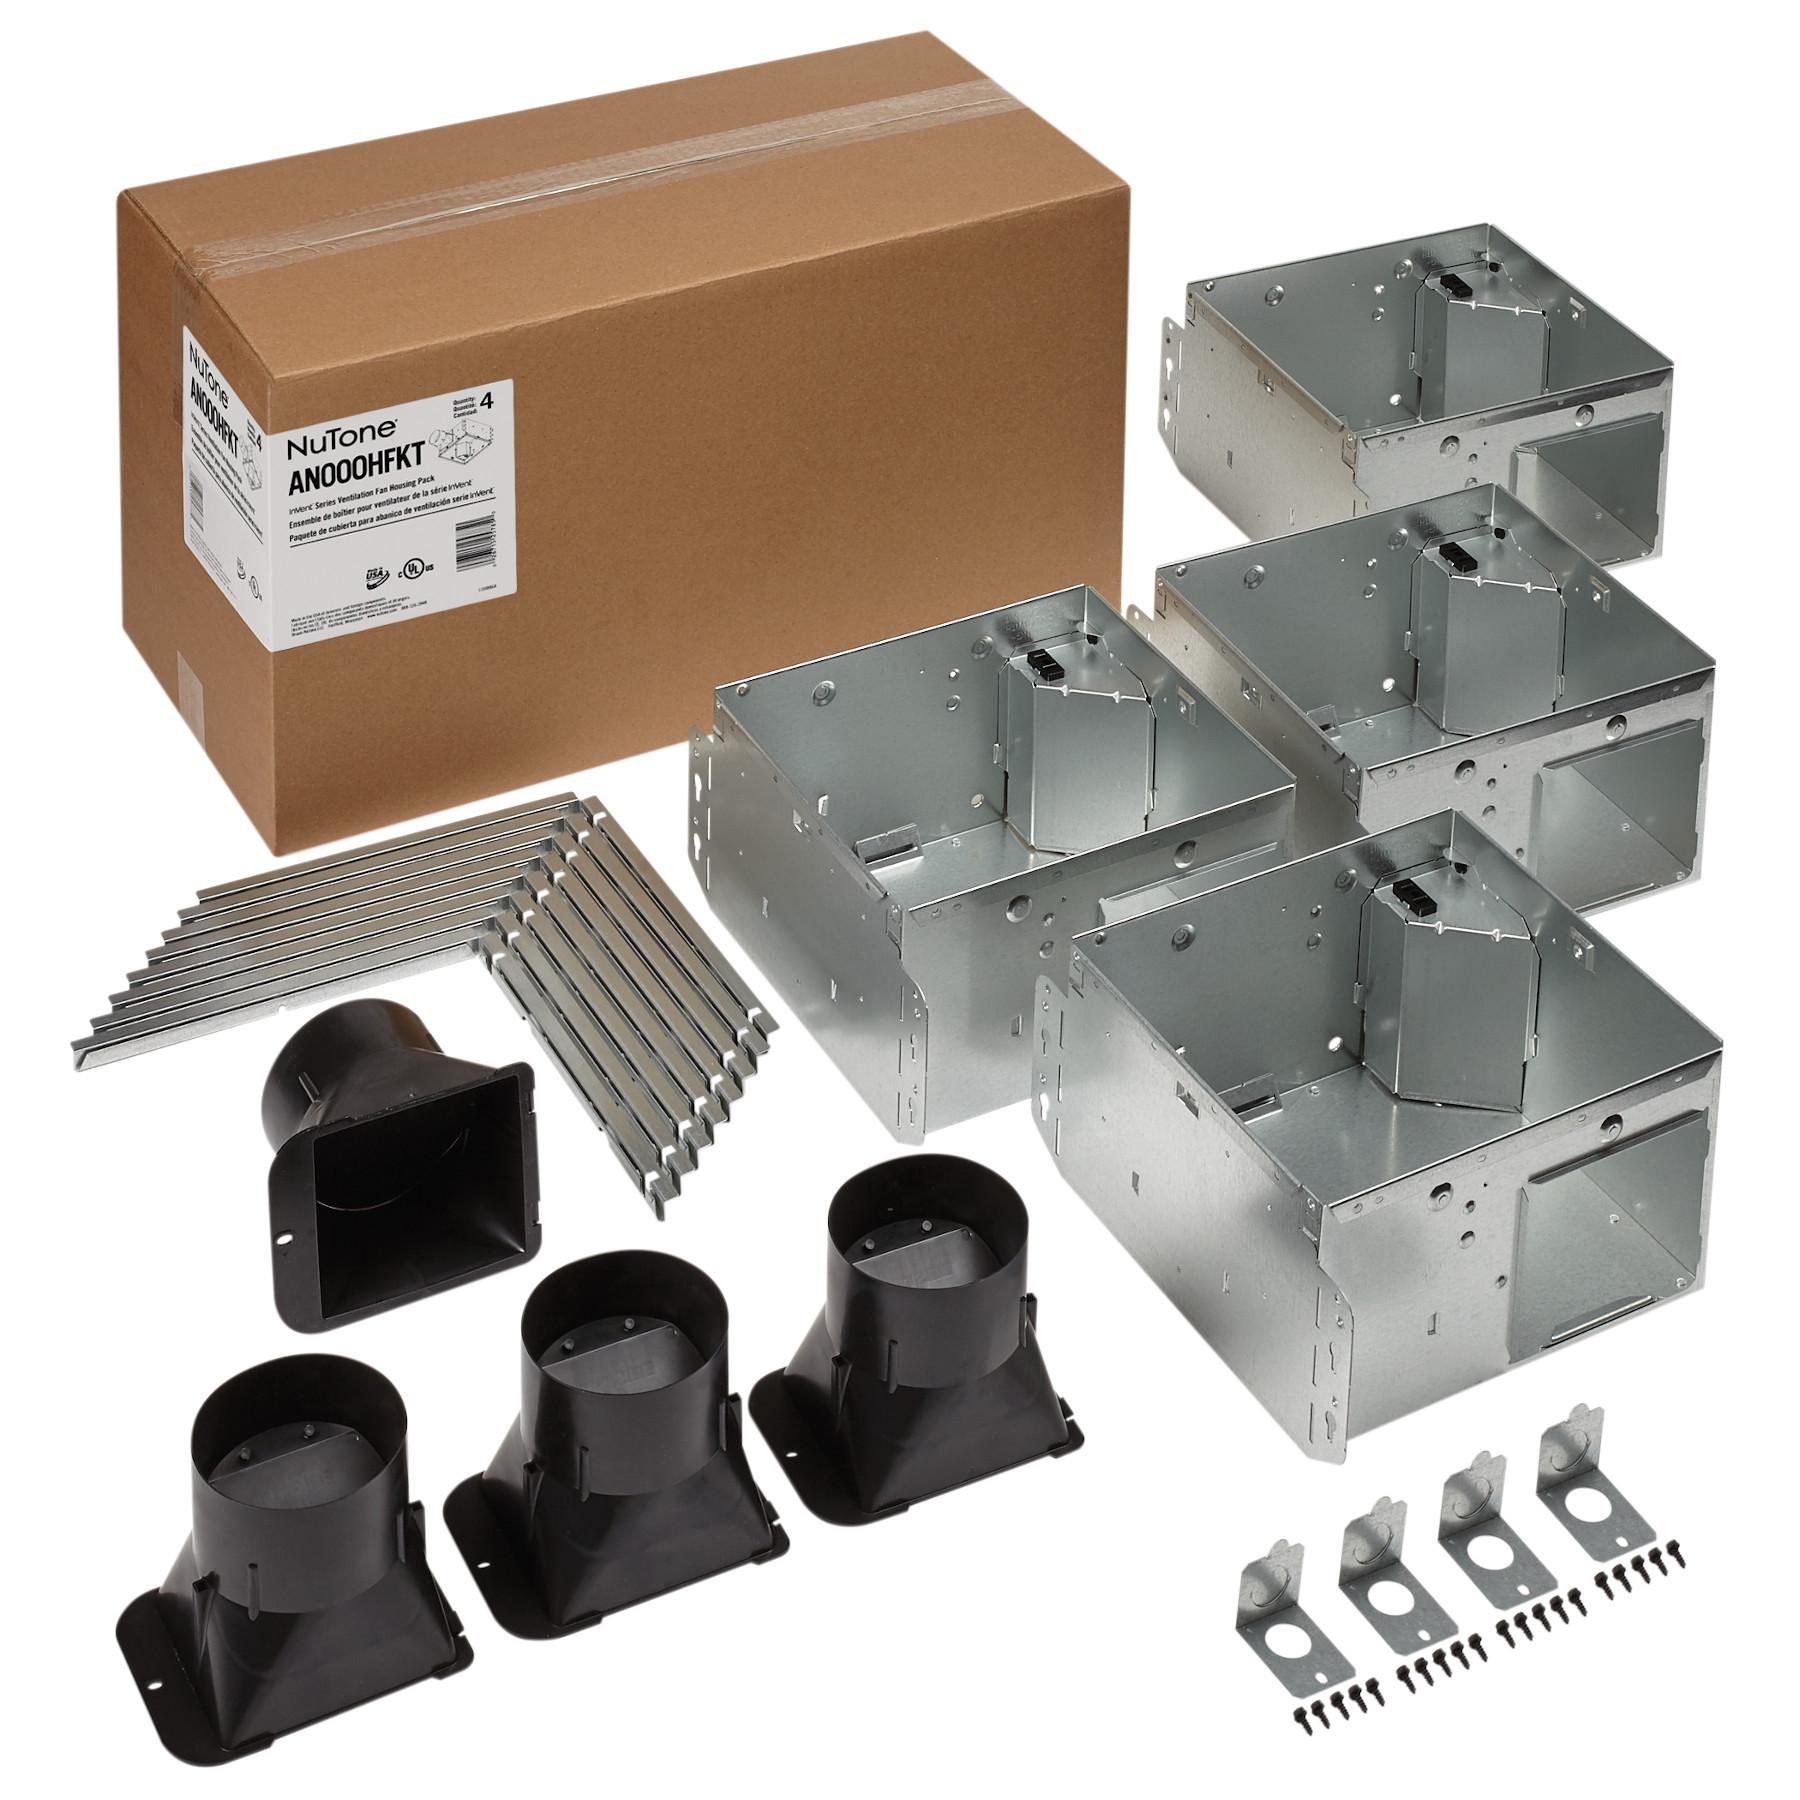 NuTone® Flex Series Ventilation Fan Housing Pack with Flange Kit